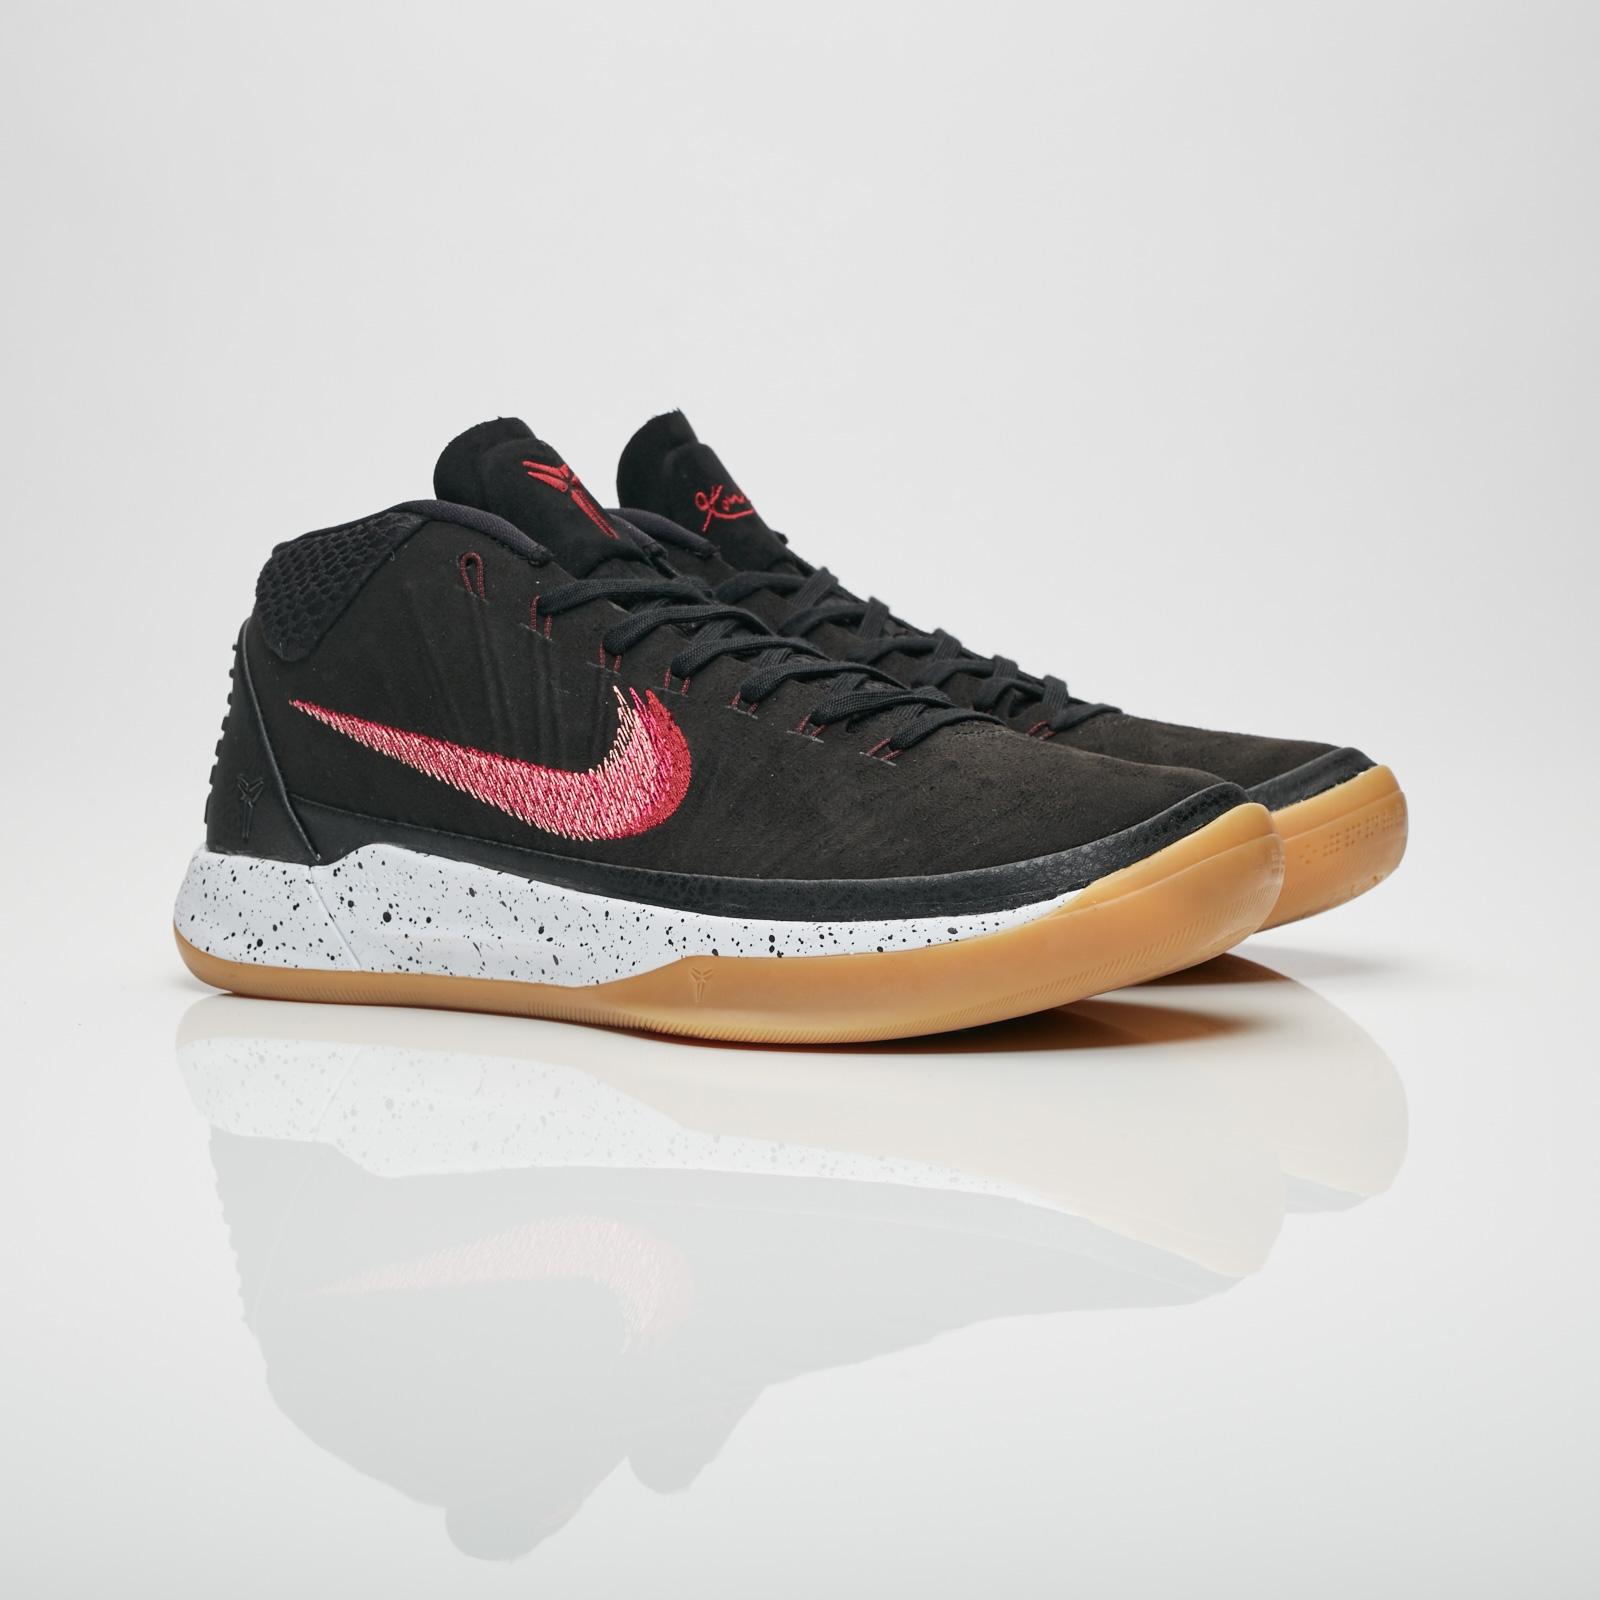 new product d9b1a 53702 Nike Basketball Kobe A.D. Genesis